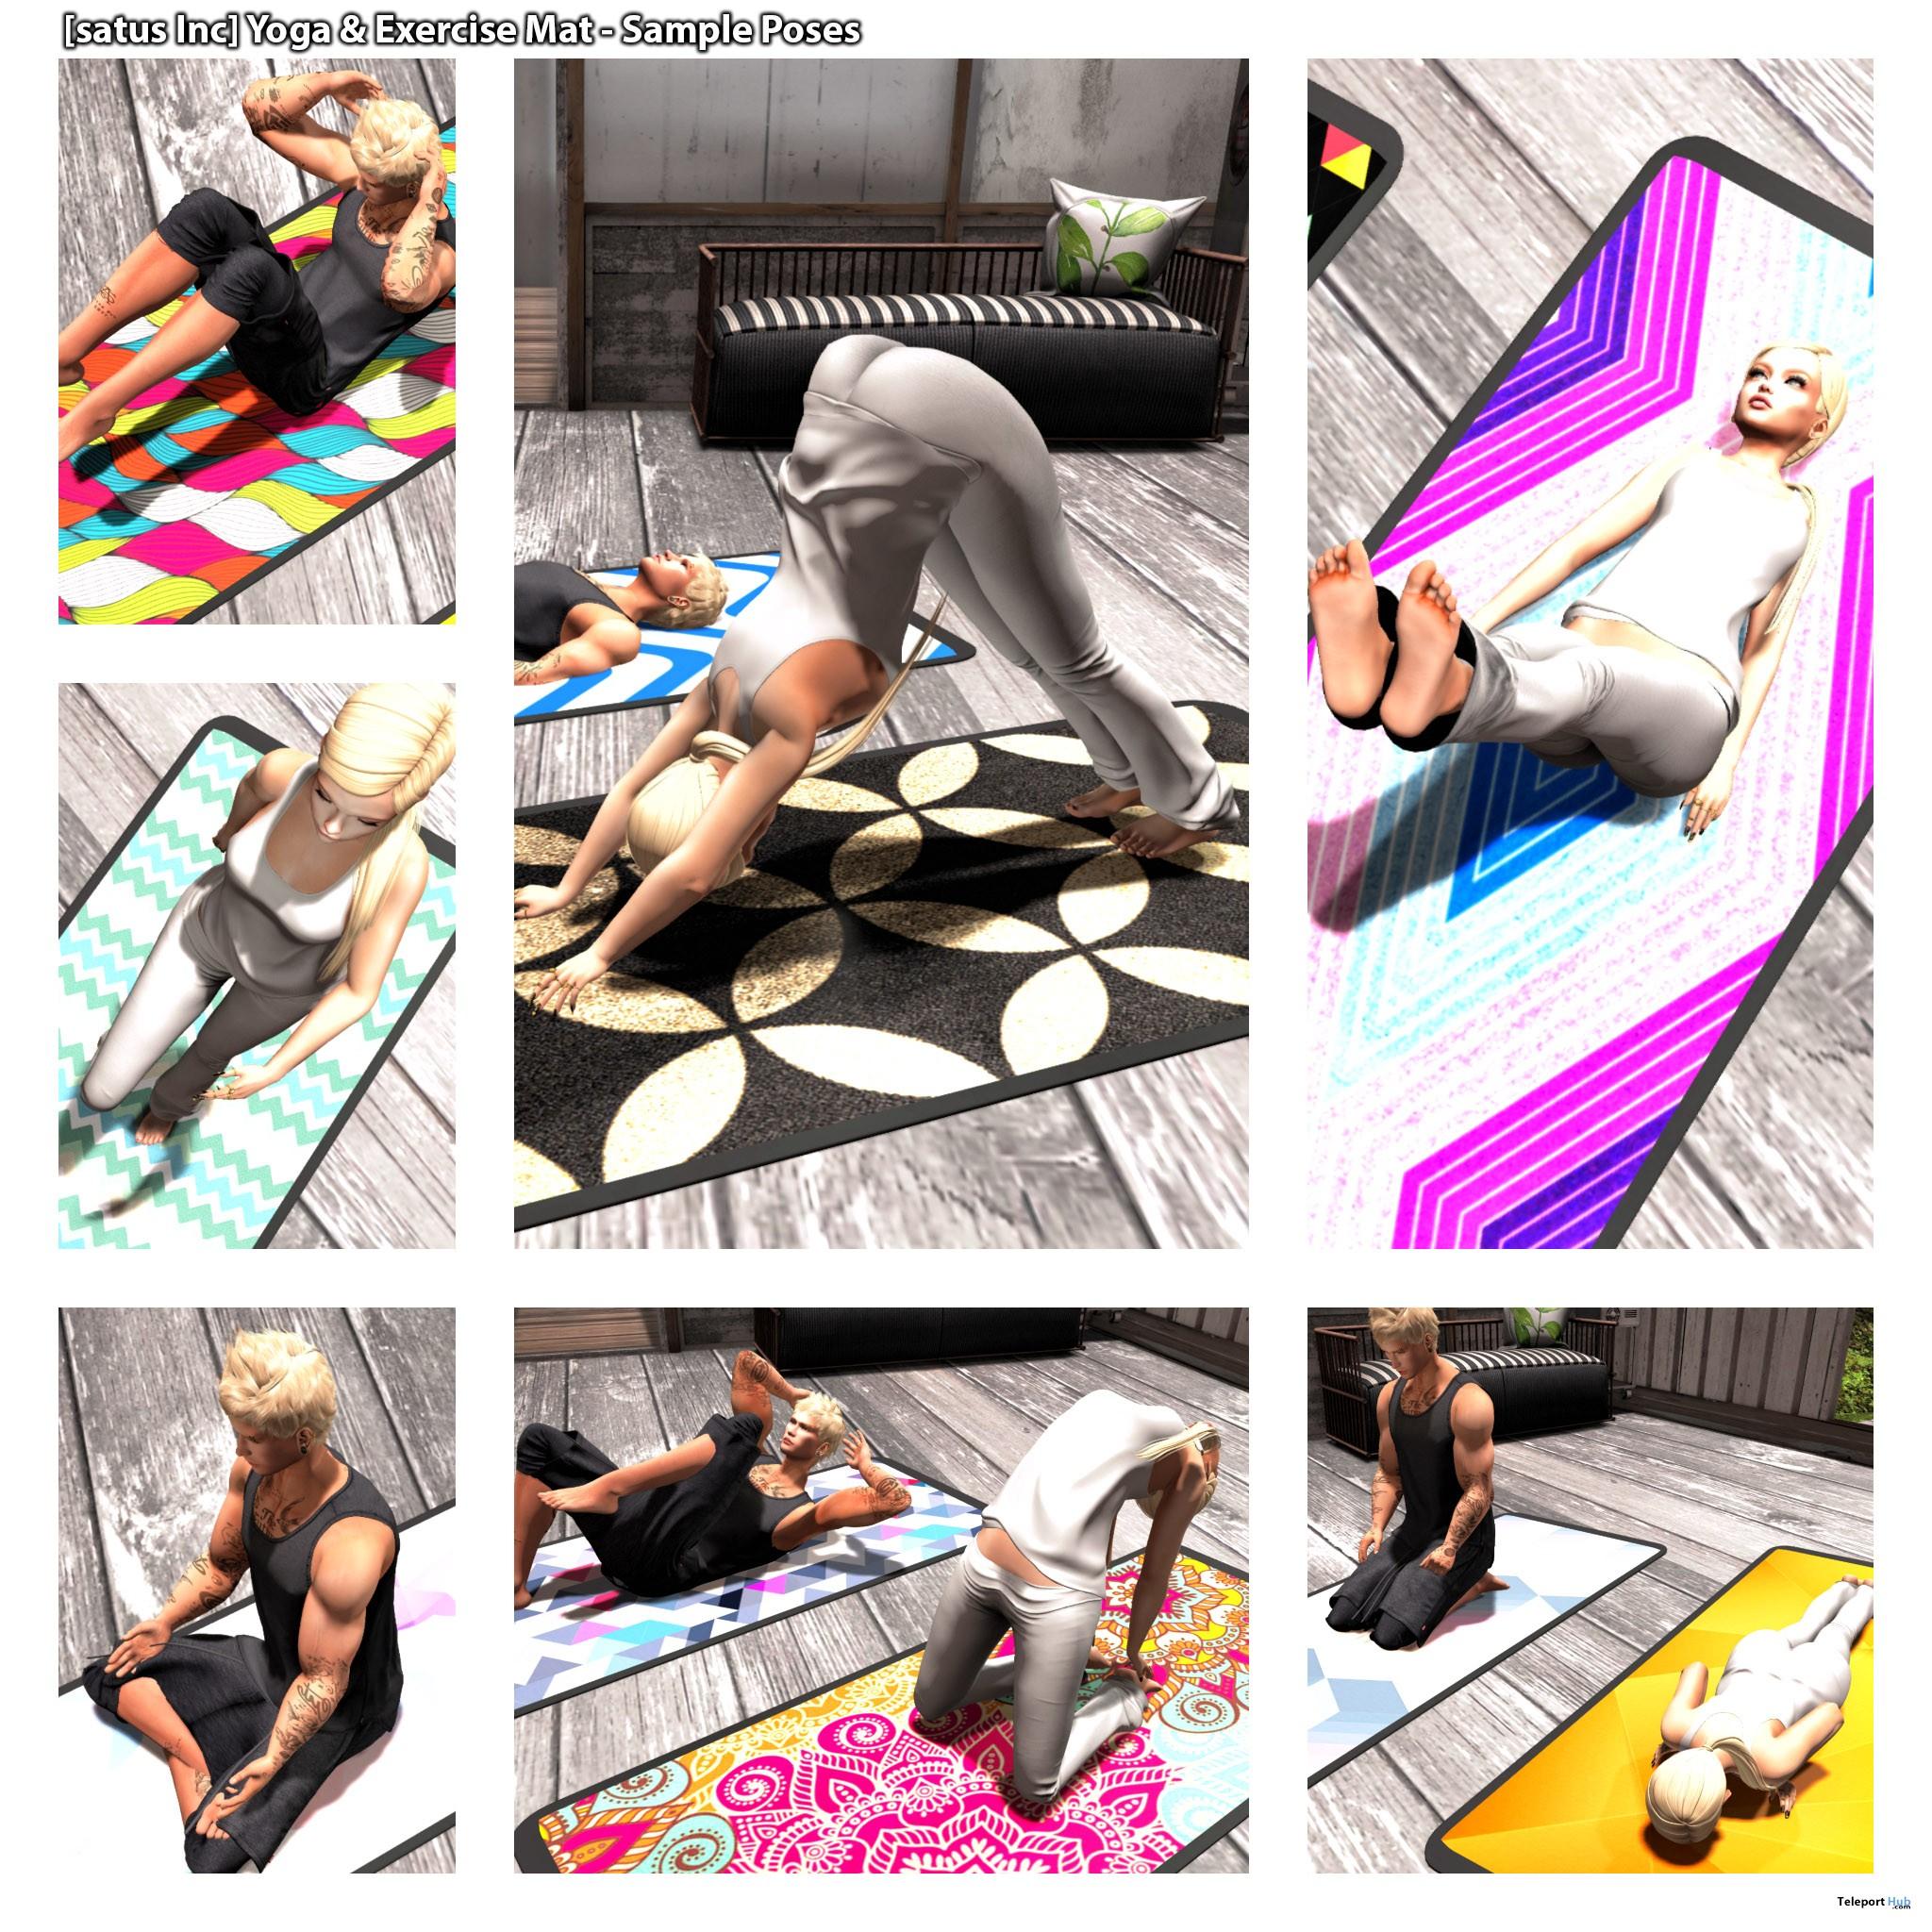 New Release: Yoga & Exercise Mat by [satus Inc] - Teleport Hub - teleporthub.com